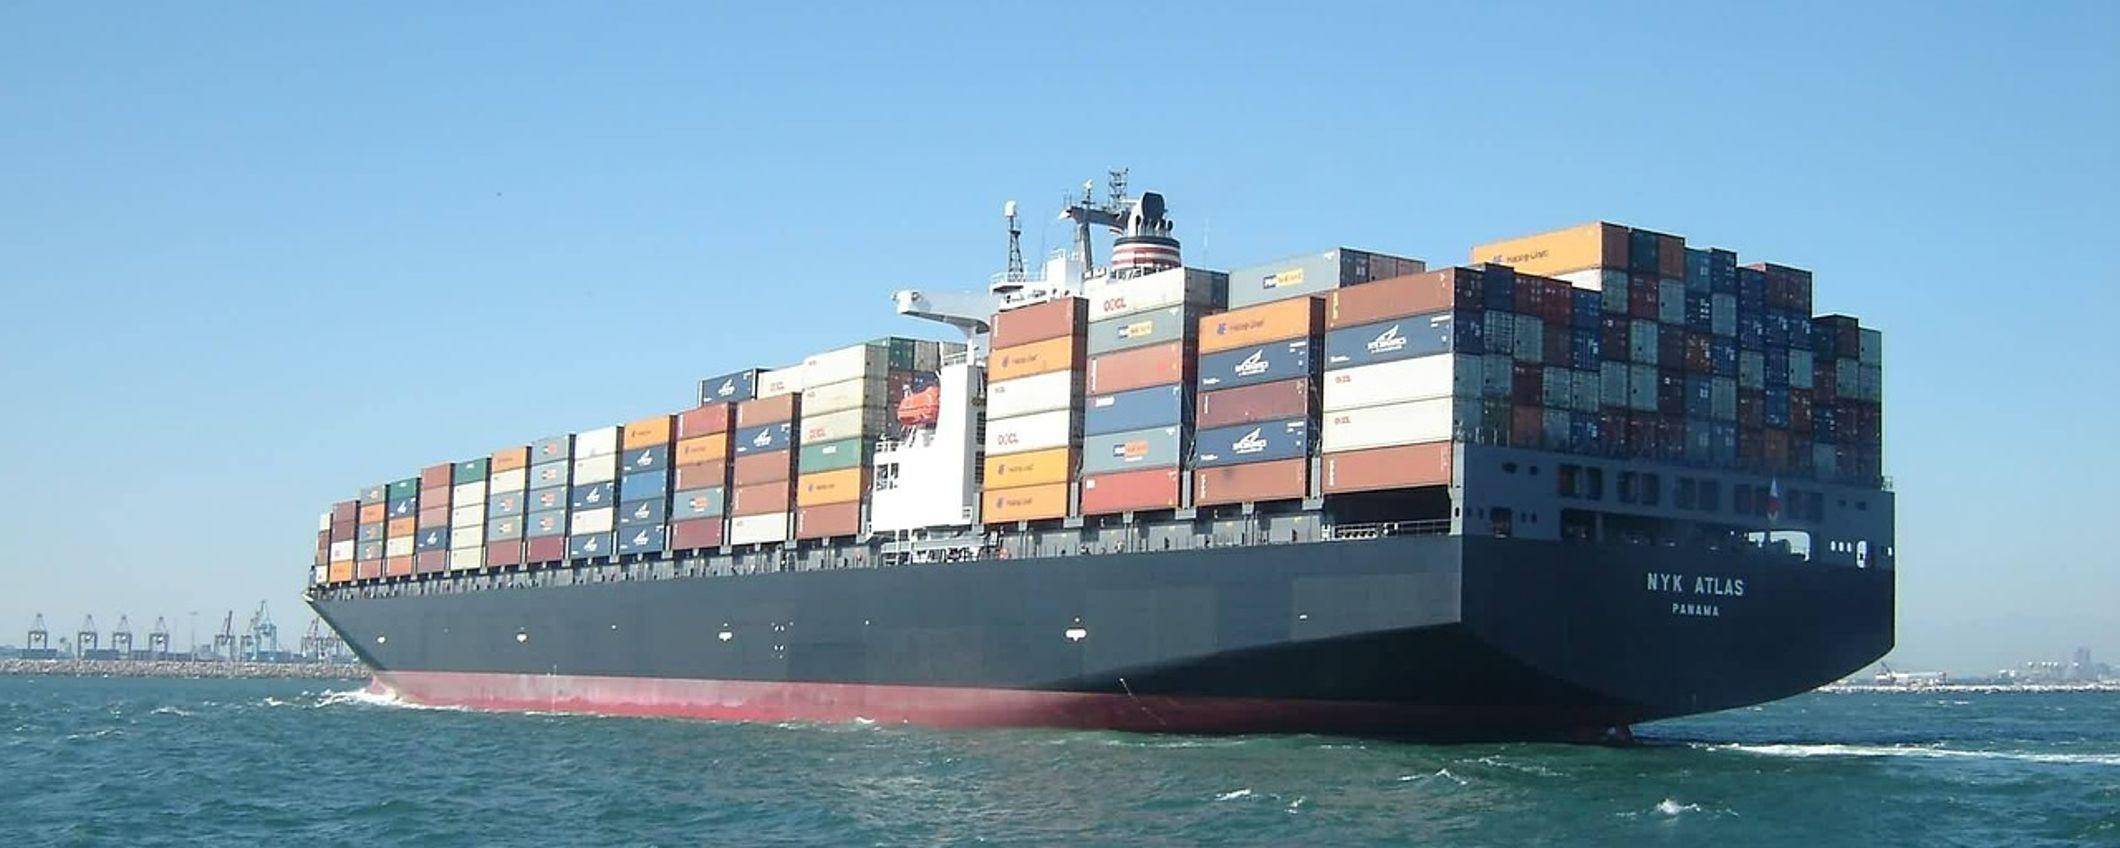 Containerschiff_Triodos-Bank